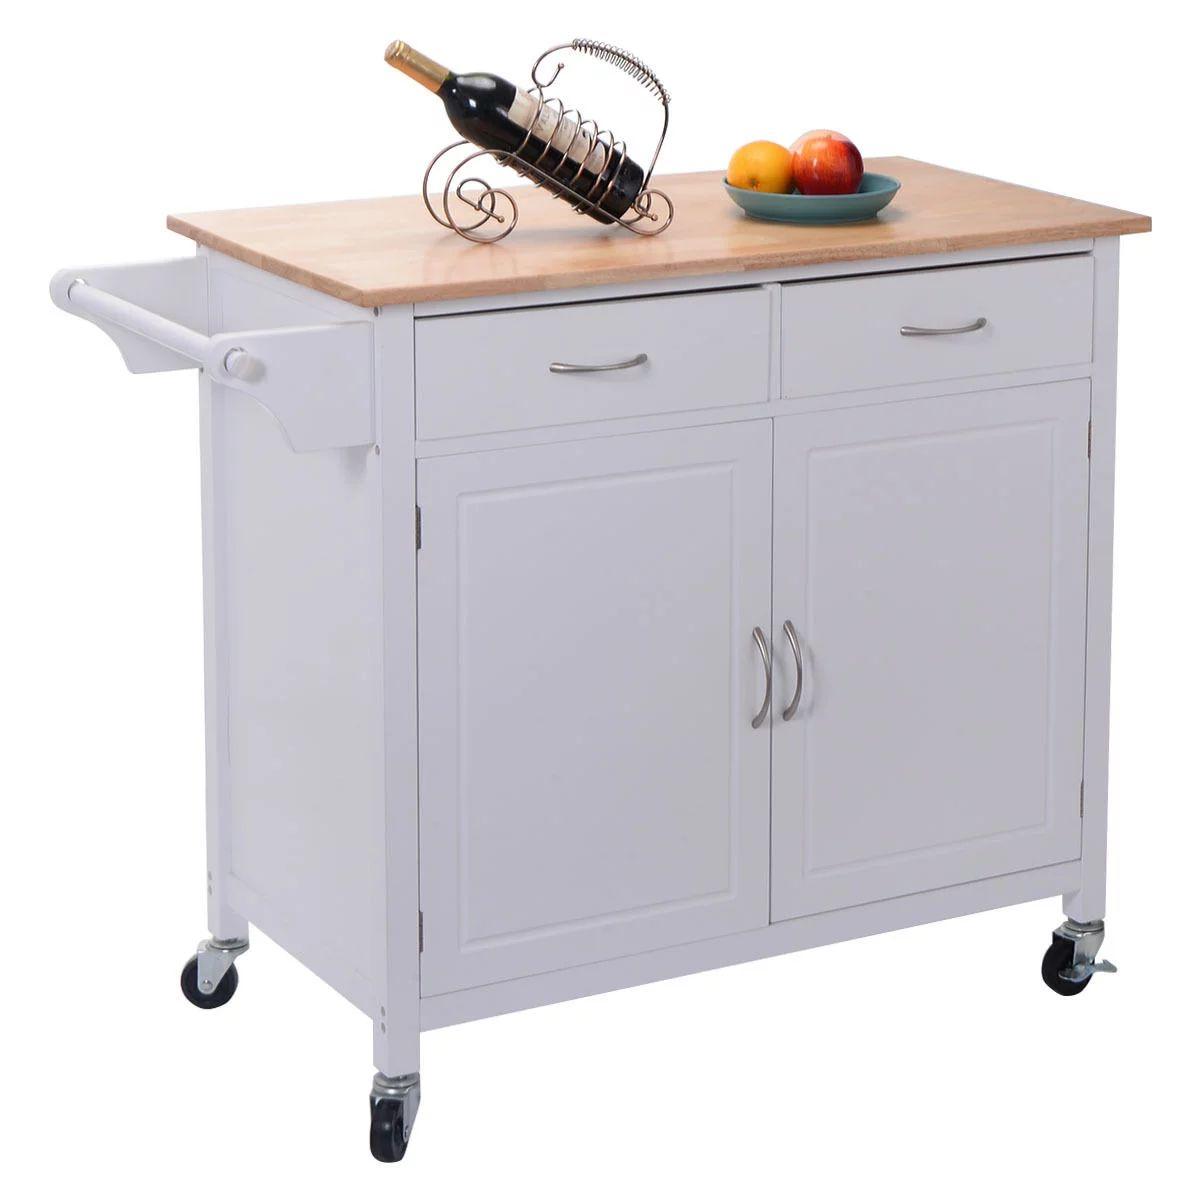 Costway rolling kitchen cart island wood top storage trolley cabinet utility modern walmart com